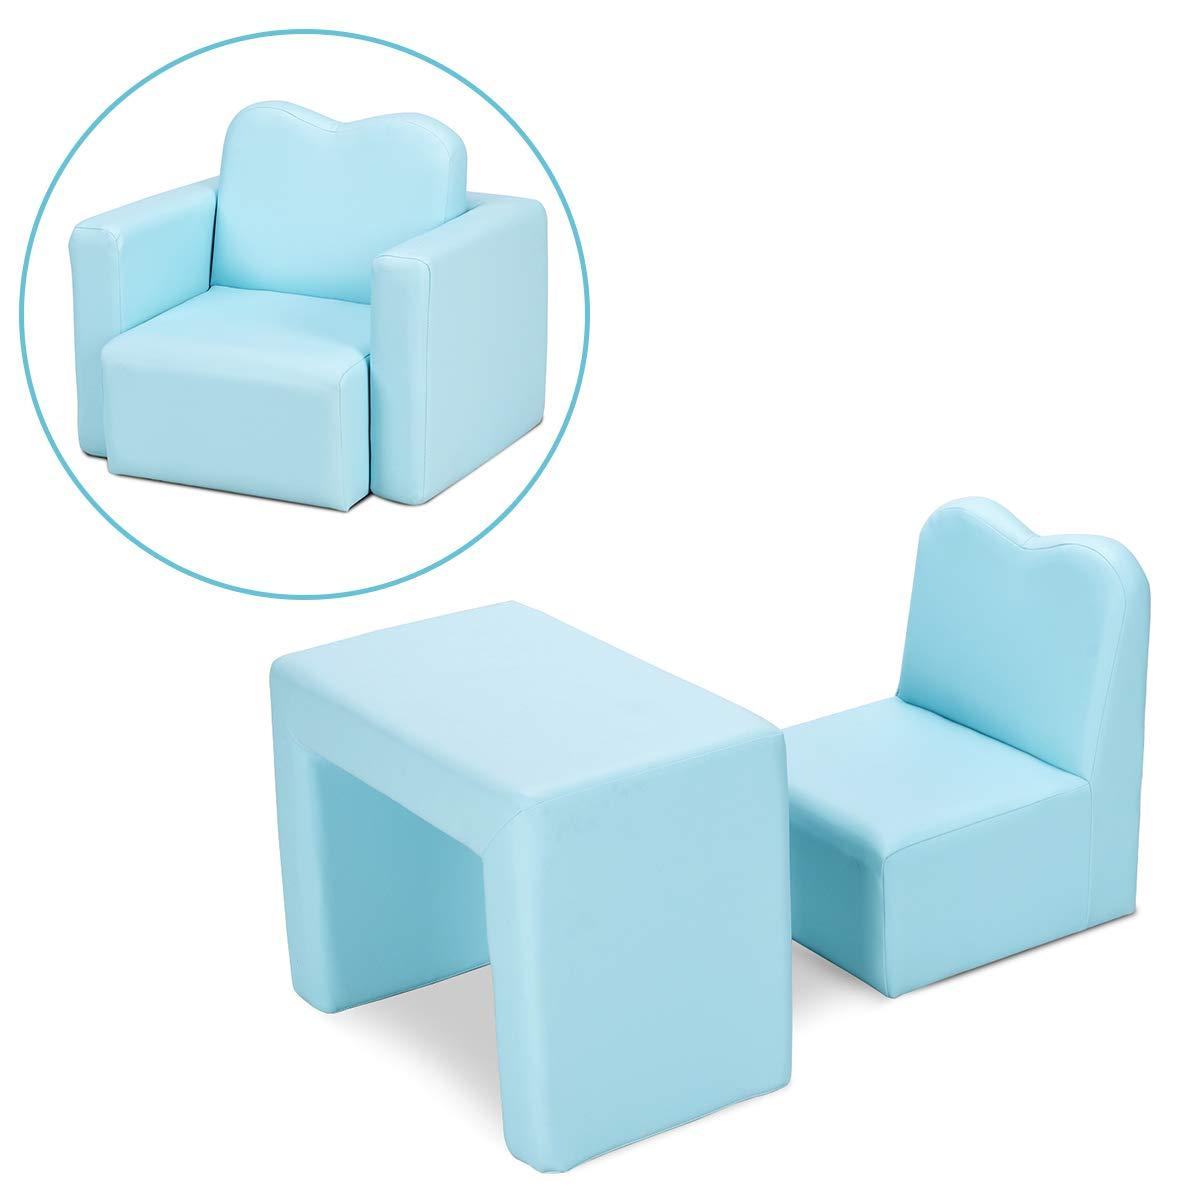 HONEY JOY Kids Sofa, 2-in-1 Multi-Functional Kids Table & Chair Set, Sturdy Wood Construction, Armrest Chair for Boys & Girls (Blue)